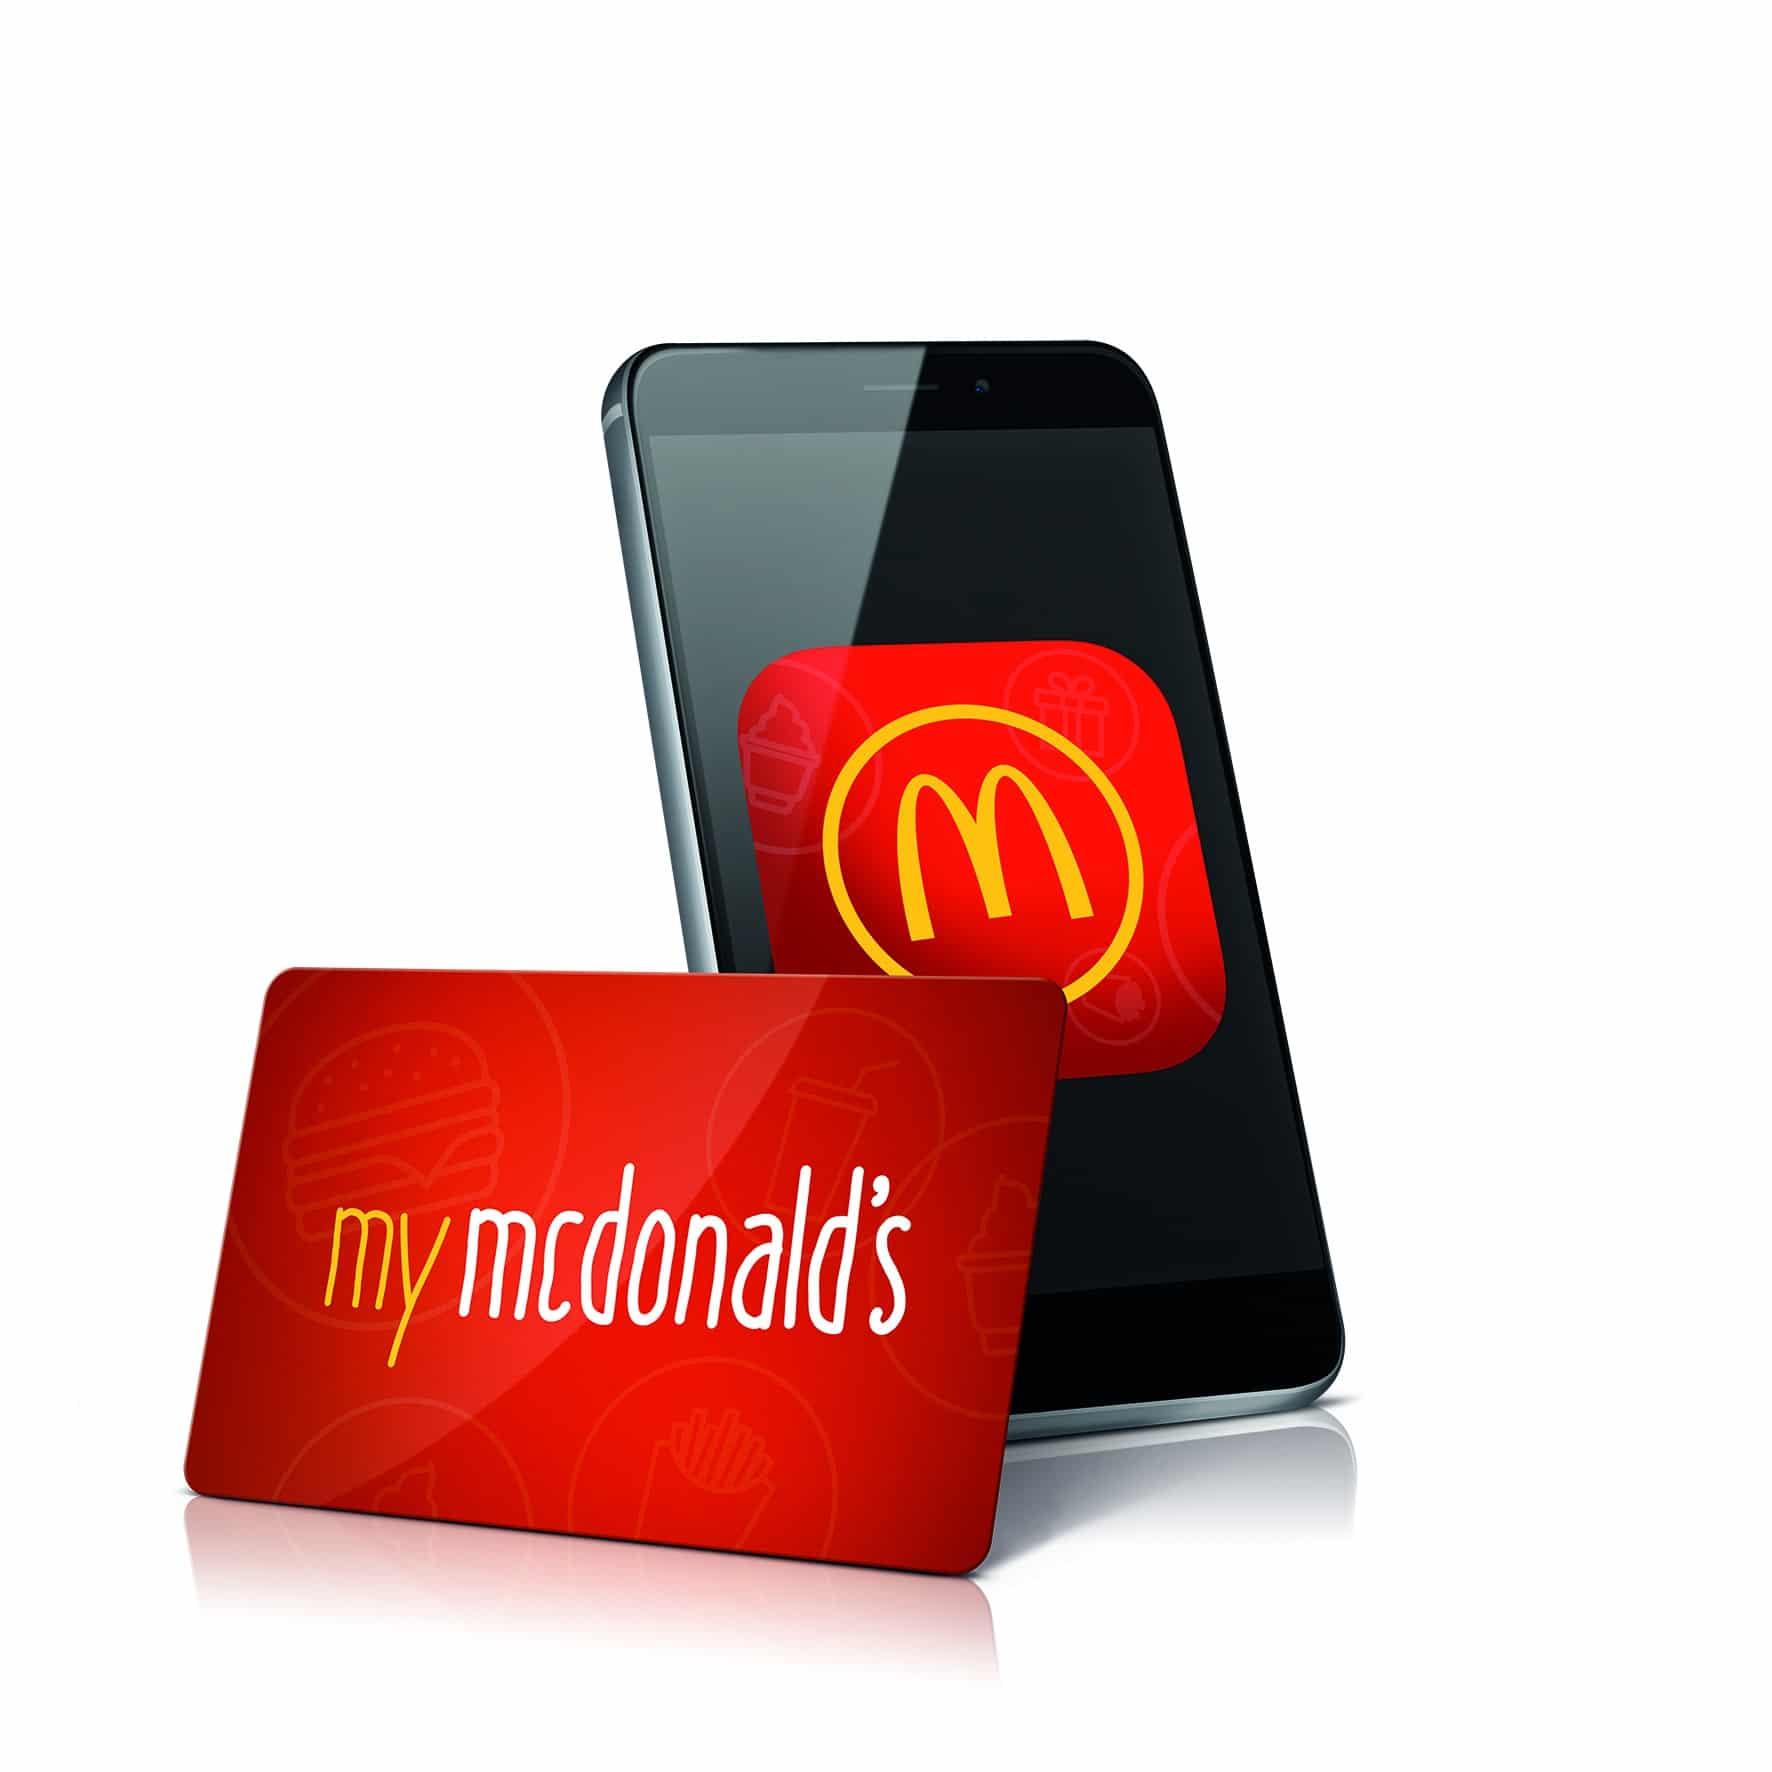 Mymcdonald S Neuer Bonusclub Fur Burgerfans Mcdonald S